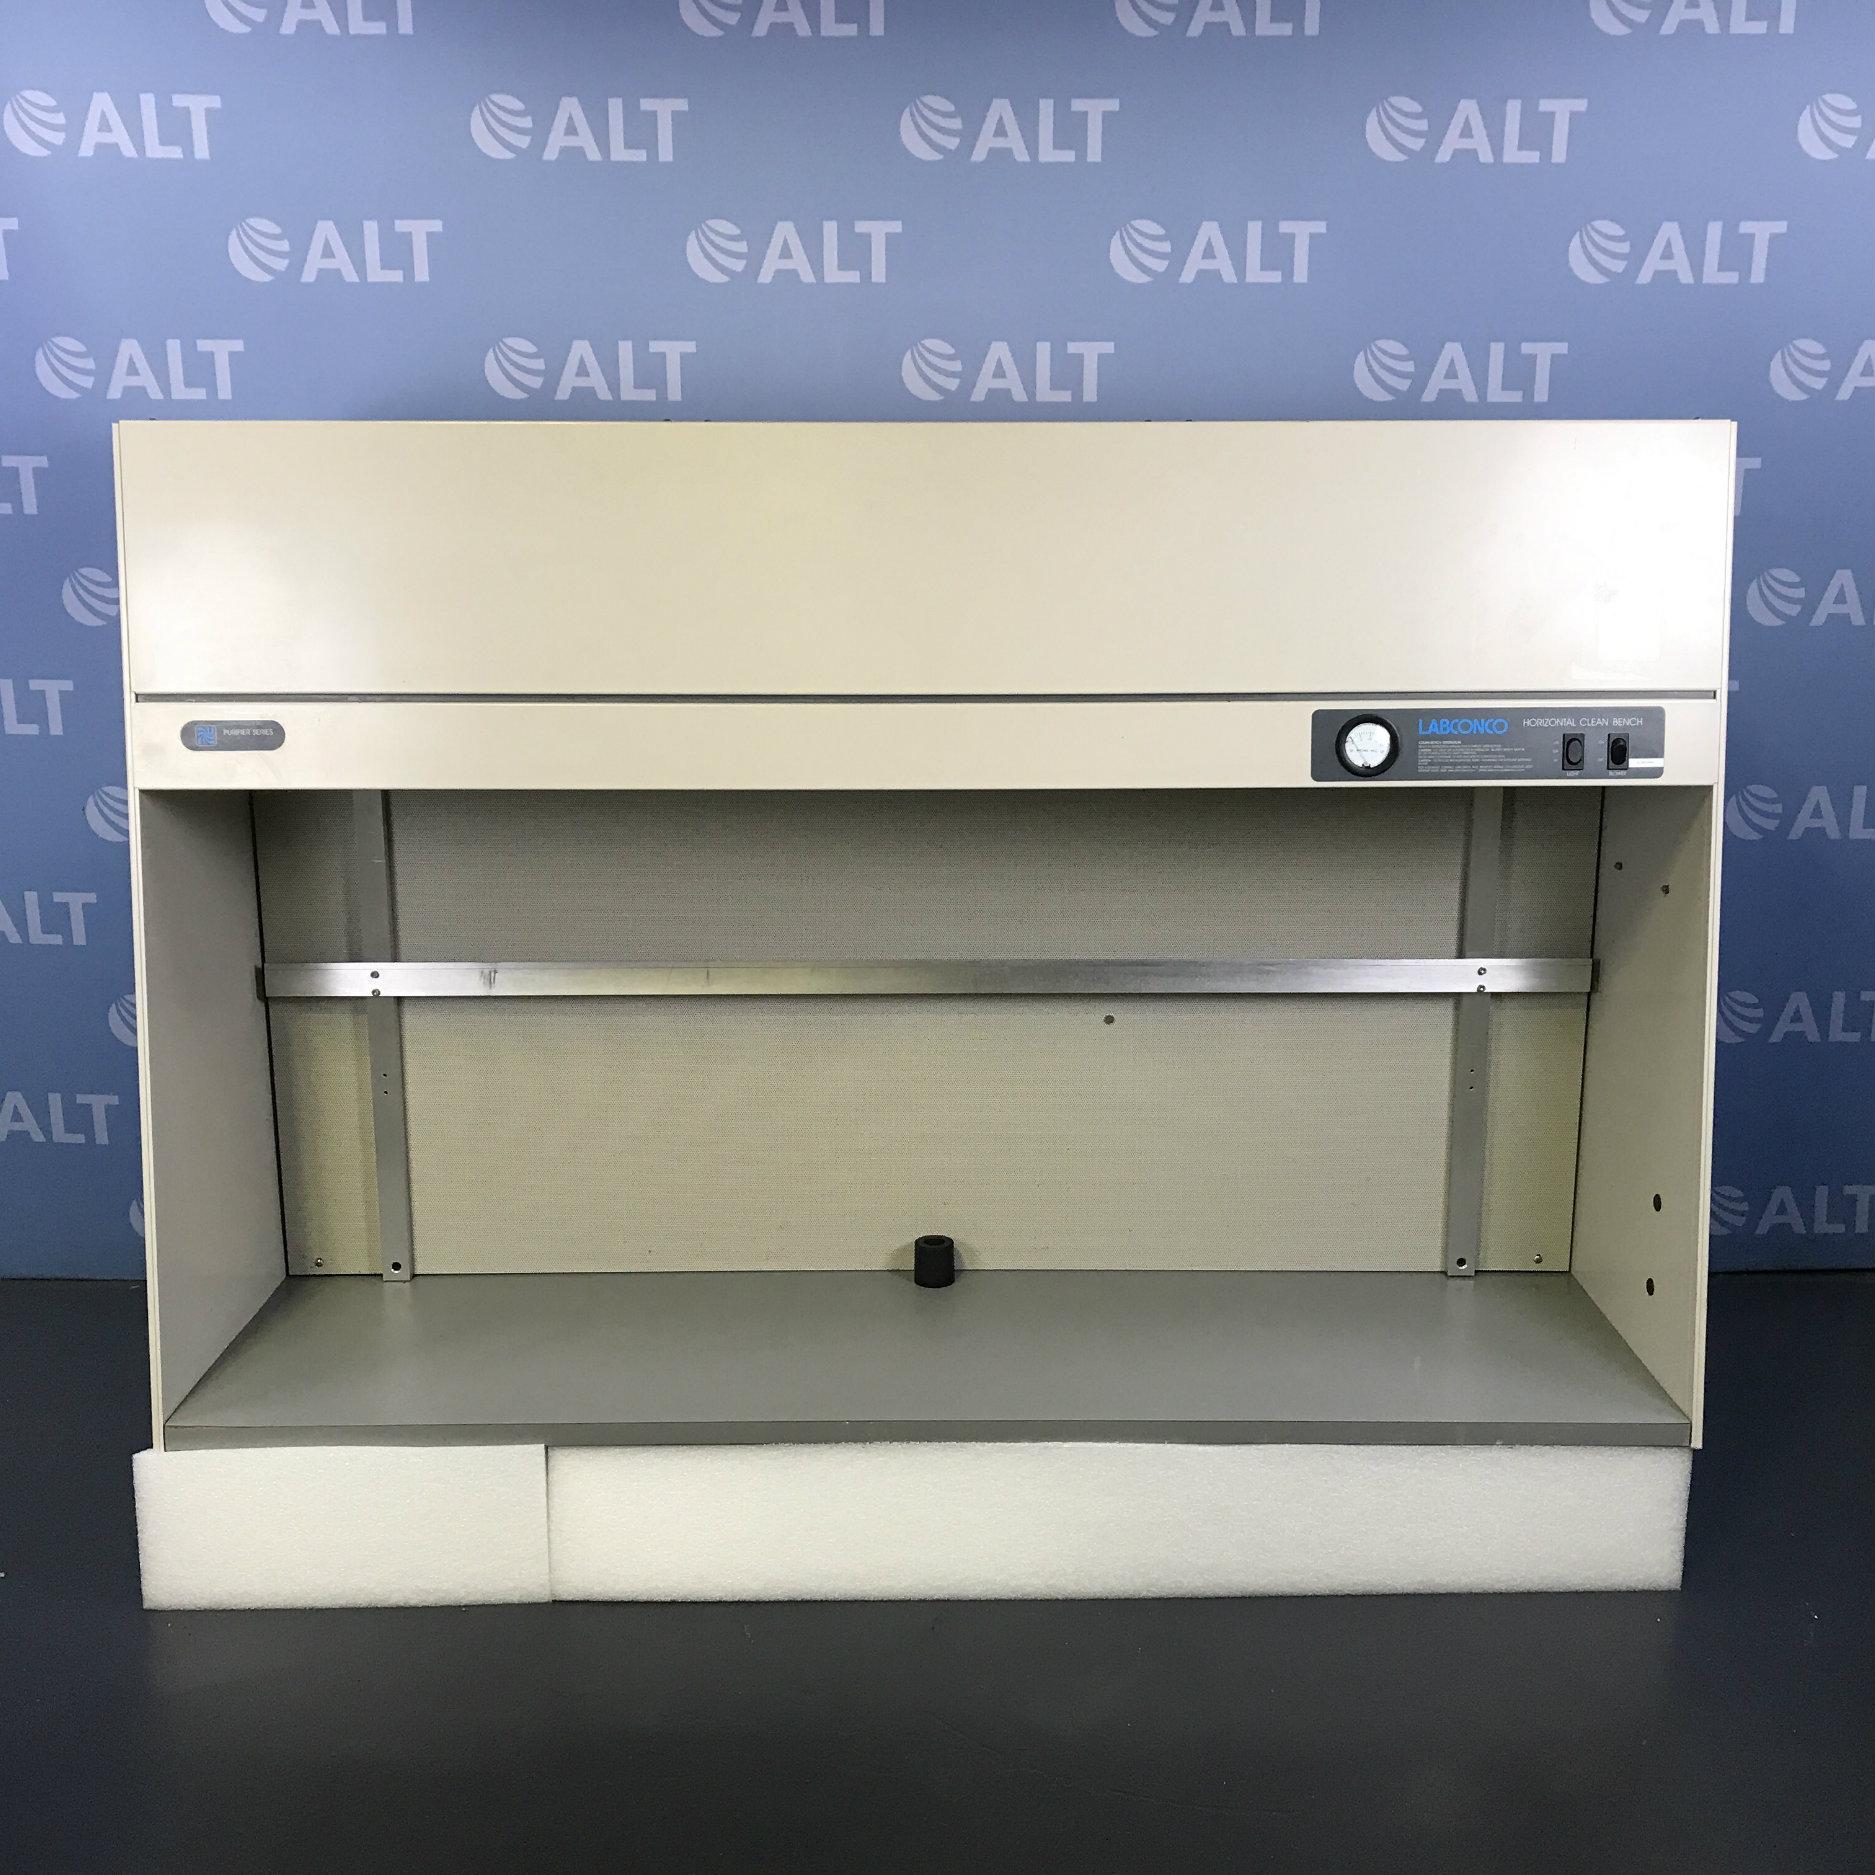 Labconco 3610000 6' Purifier Horizontal Clean Bench Image